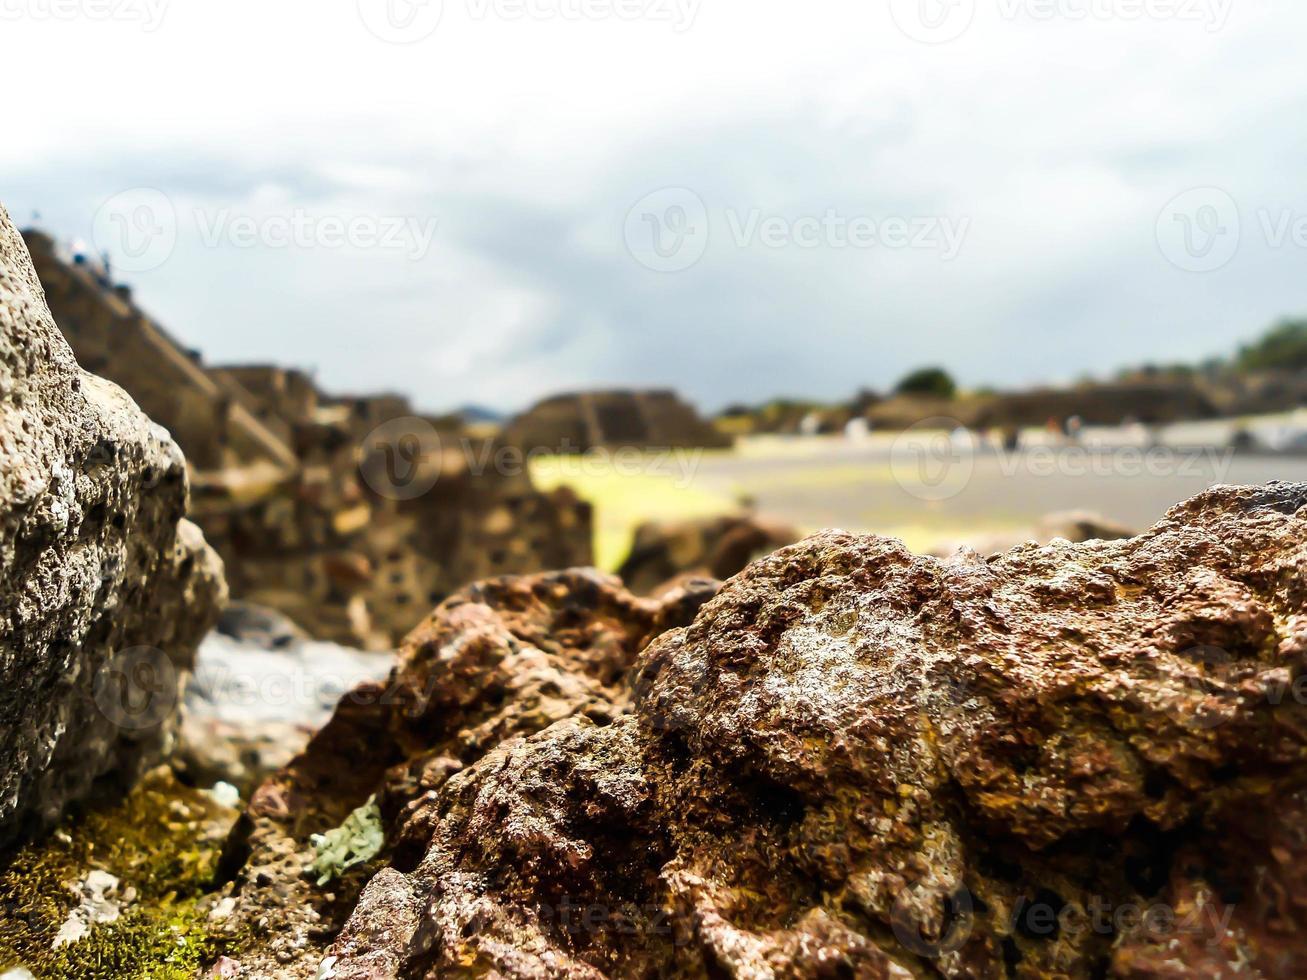 roccia vulcanica messicana preispanica foto